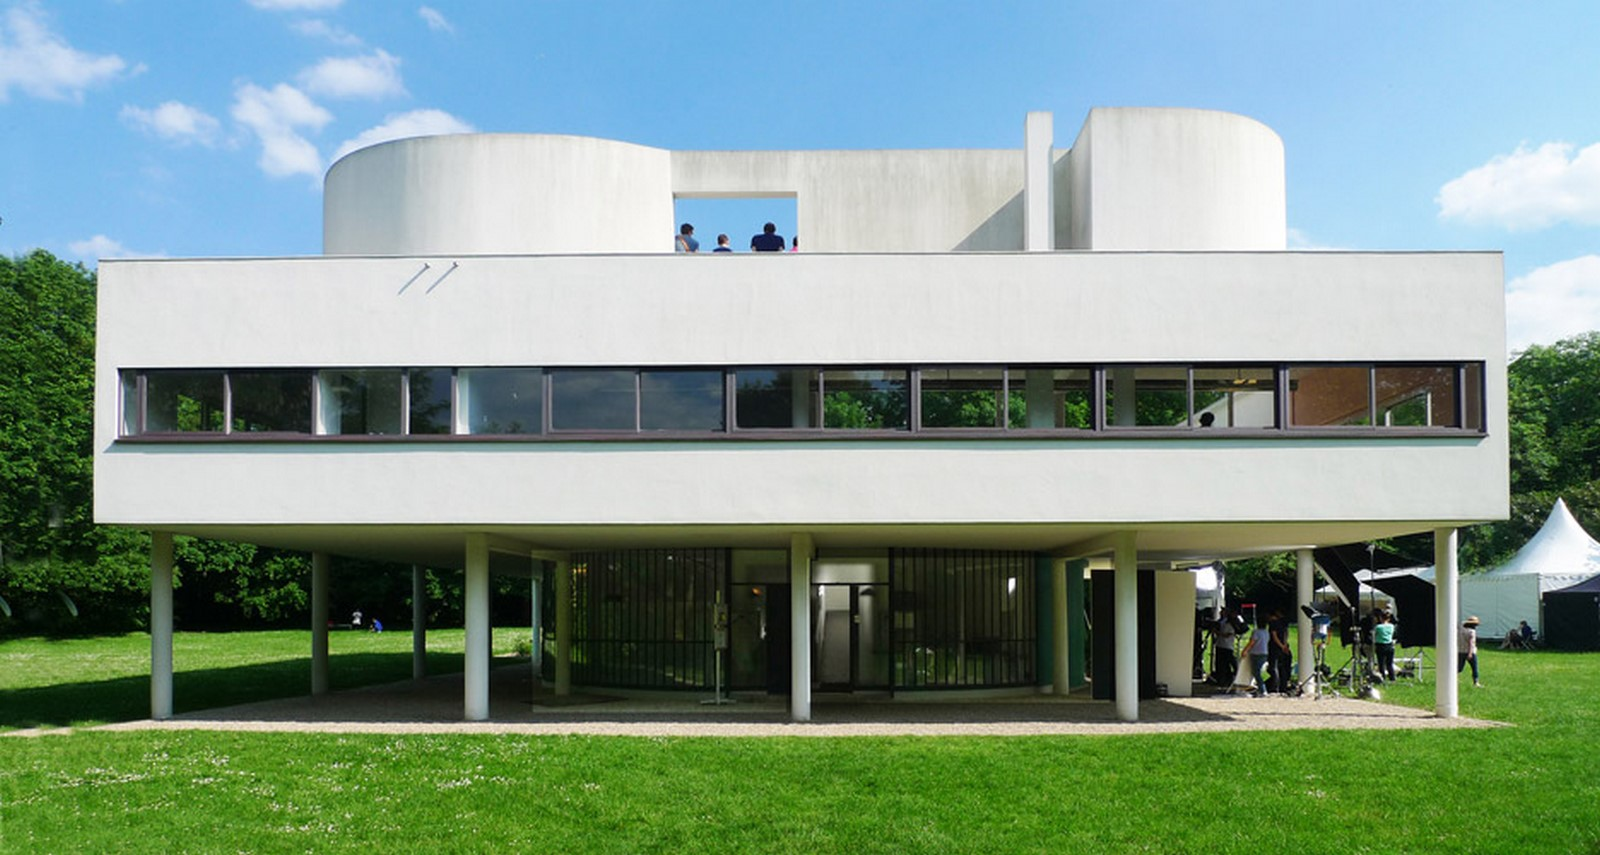 Foundation Le Corbusier